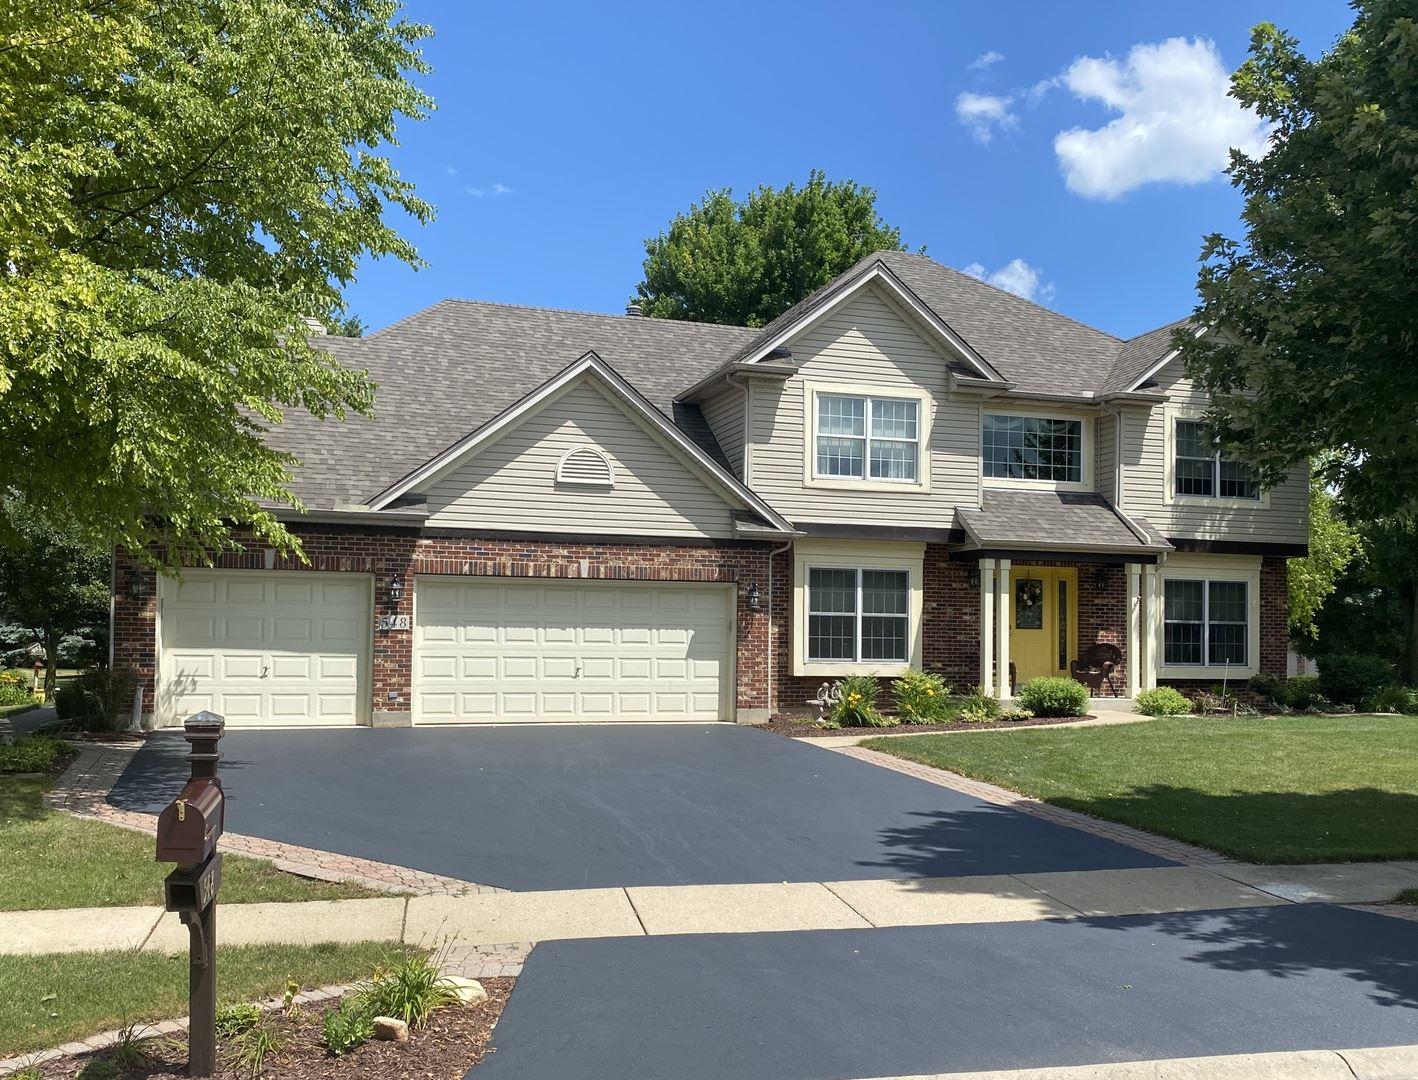 548 Arbor Lane, Oswego, IL 60543 - #: 10783597